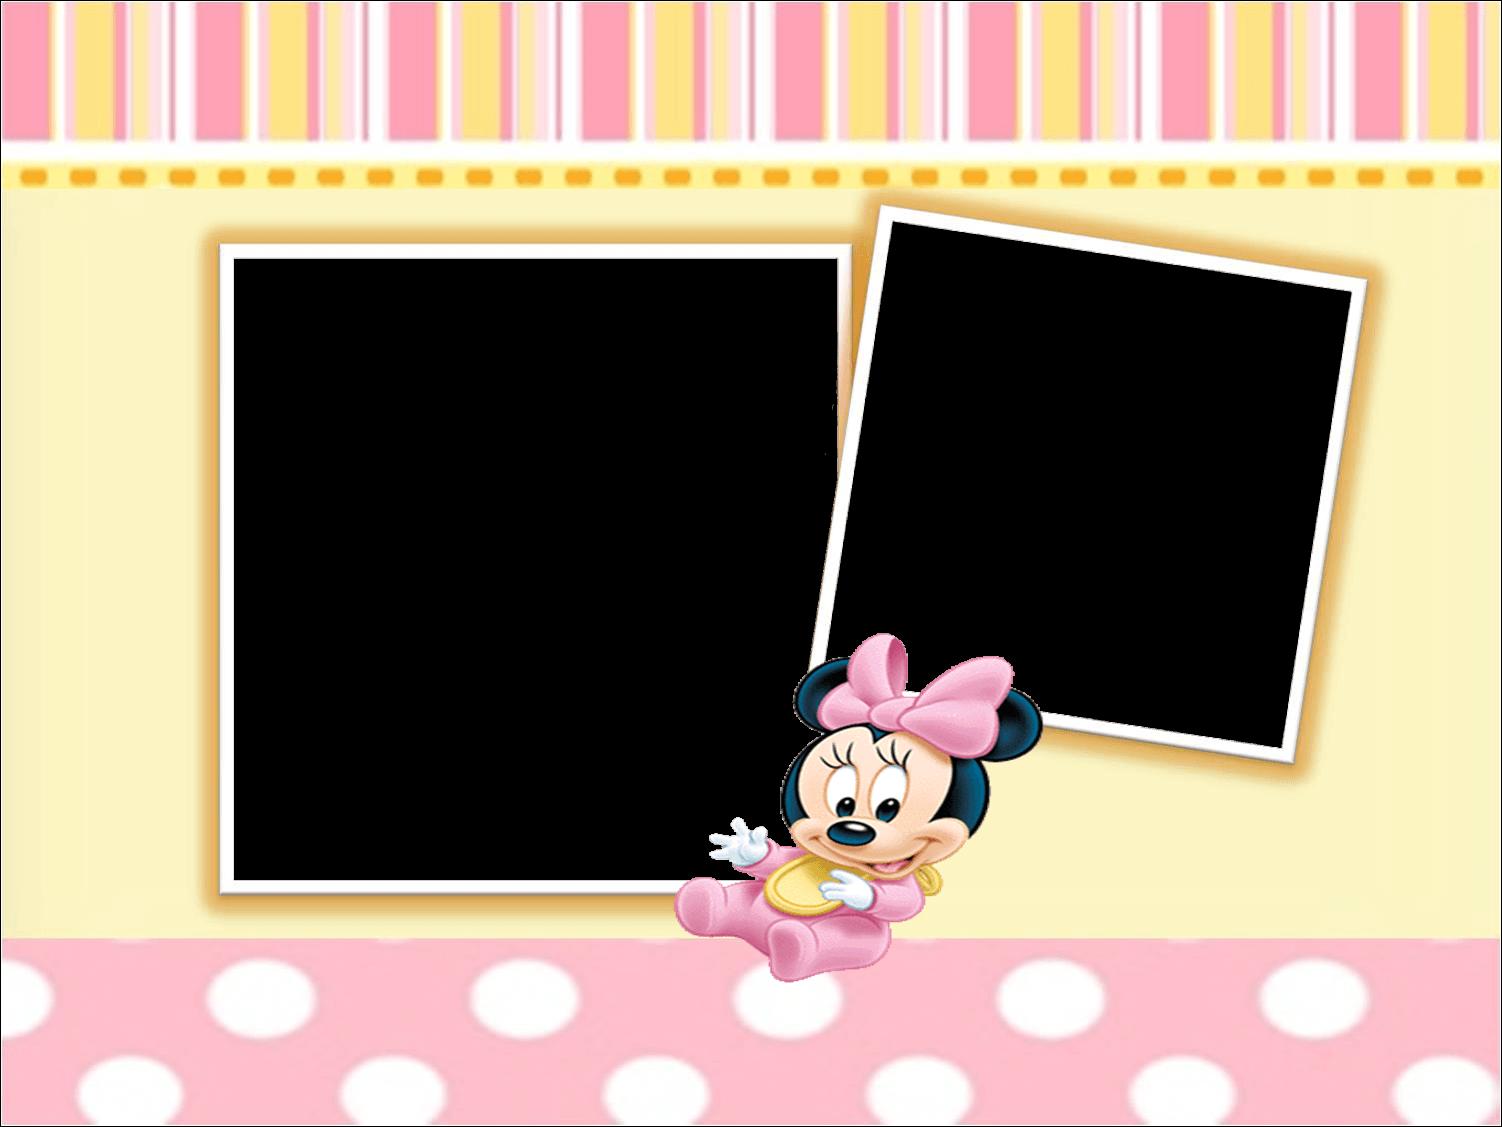 Marco de mickey mouse descargar marcos - Marcos fotos bebes ...